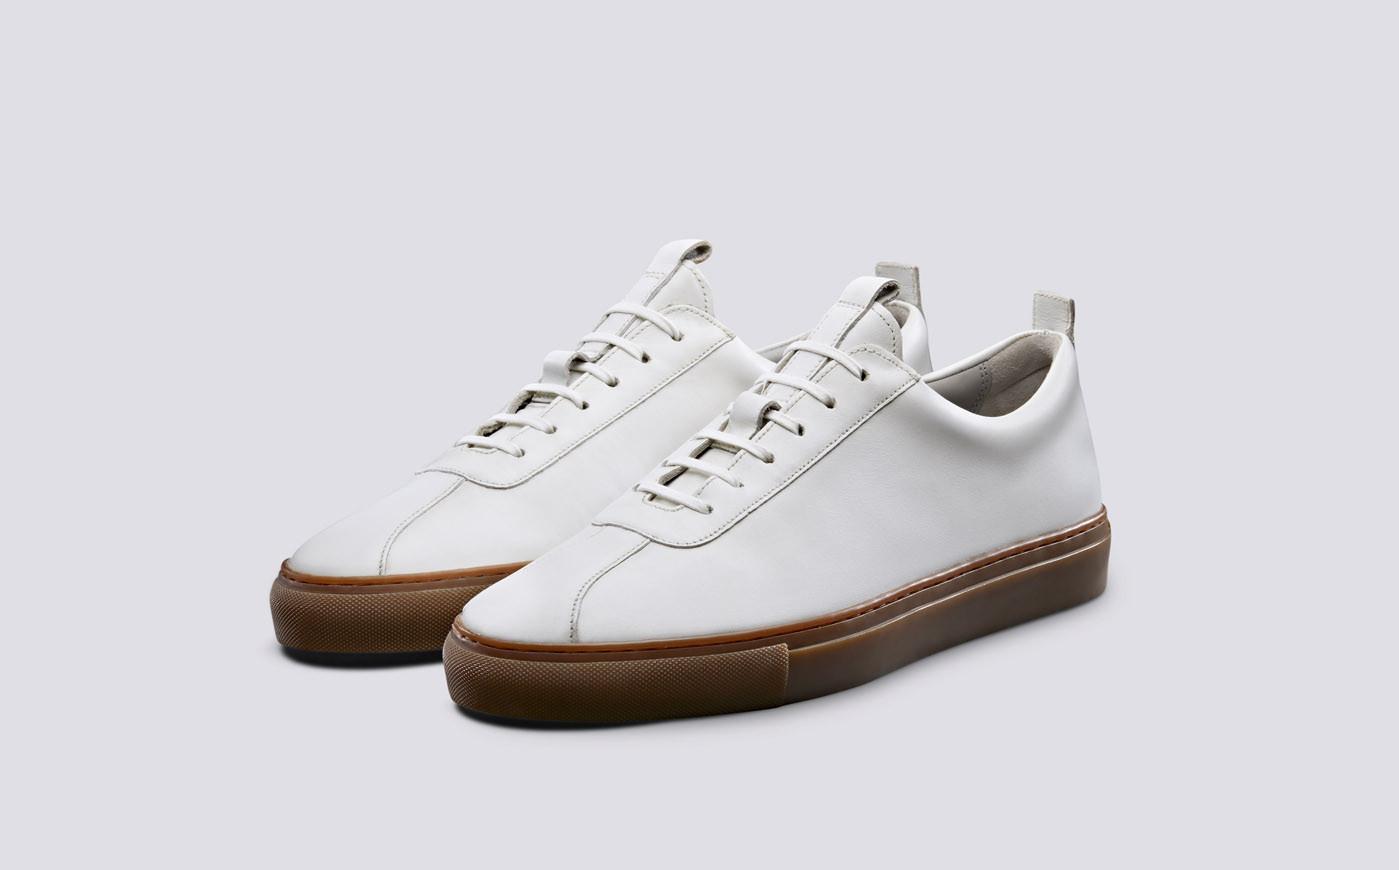 Sneaker 1 Wit Oxford Kalfsleder-2